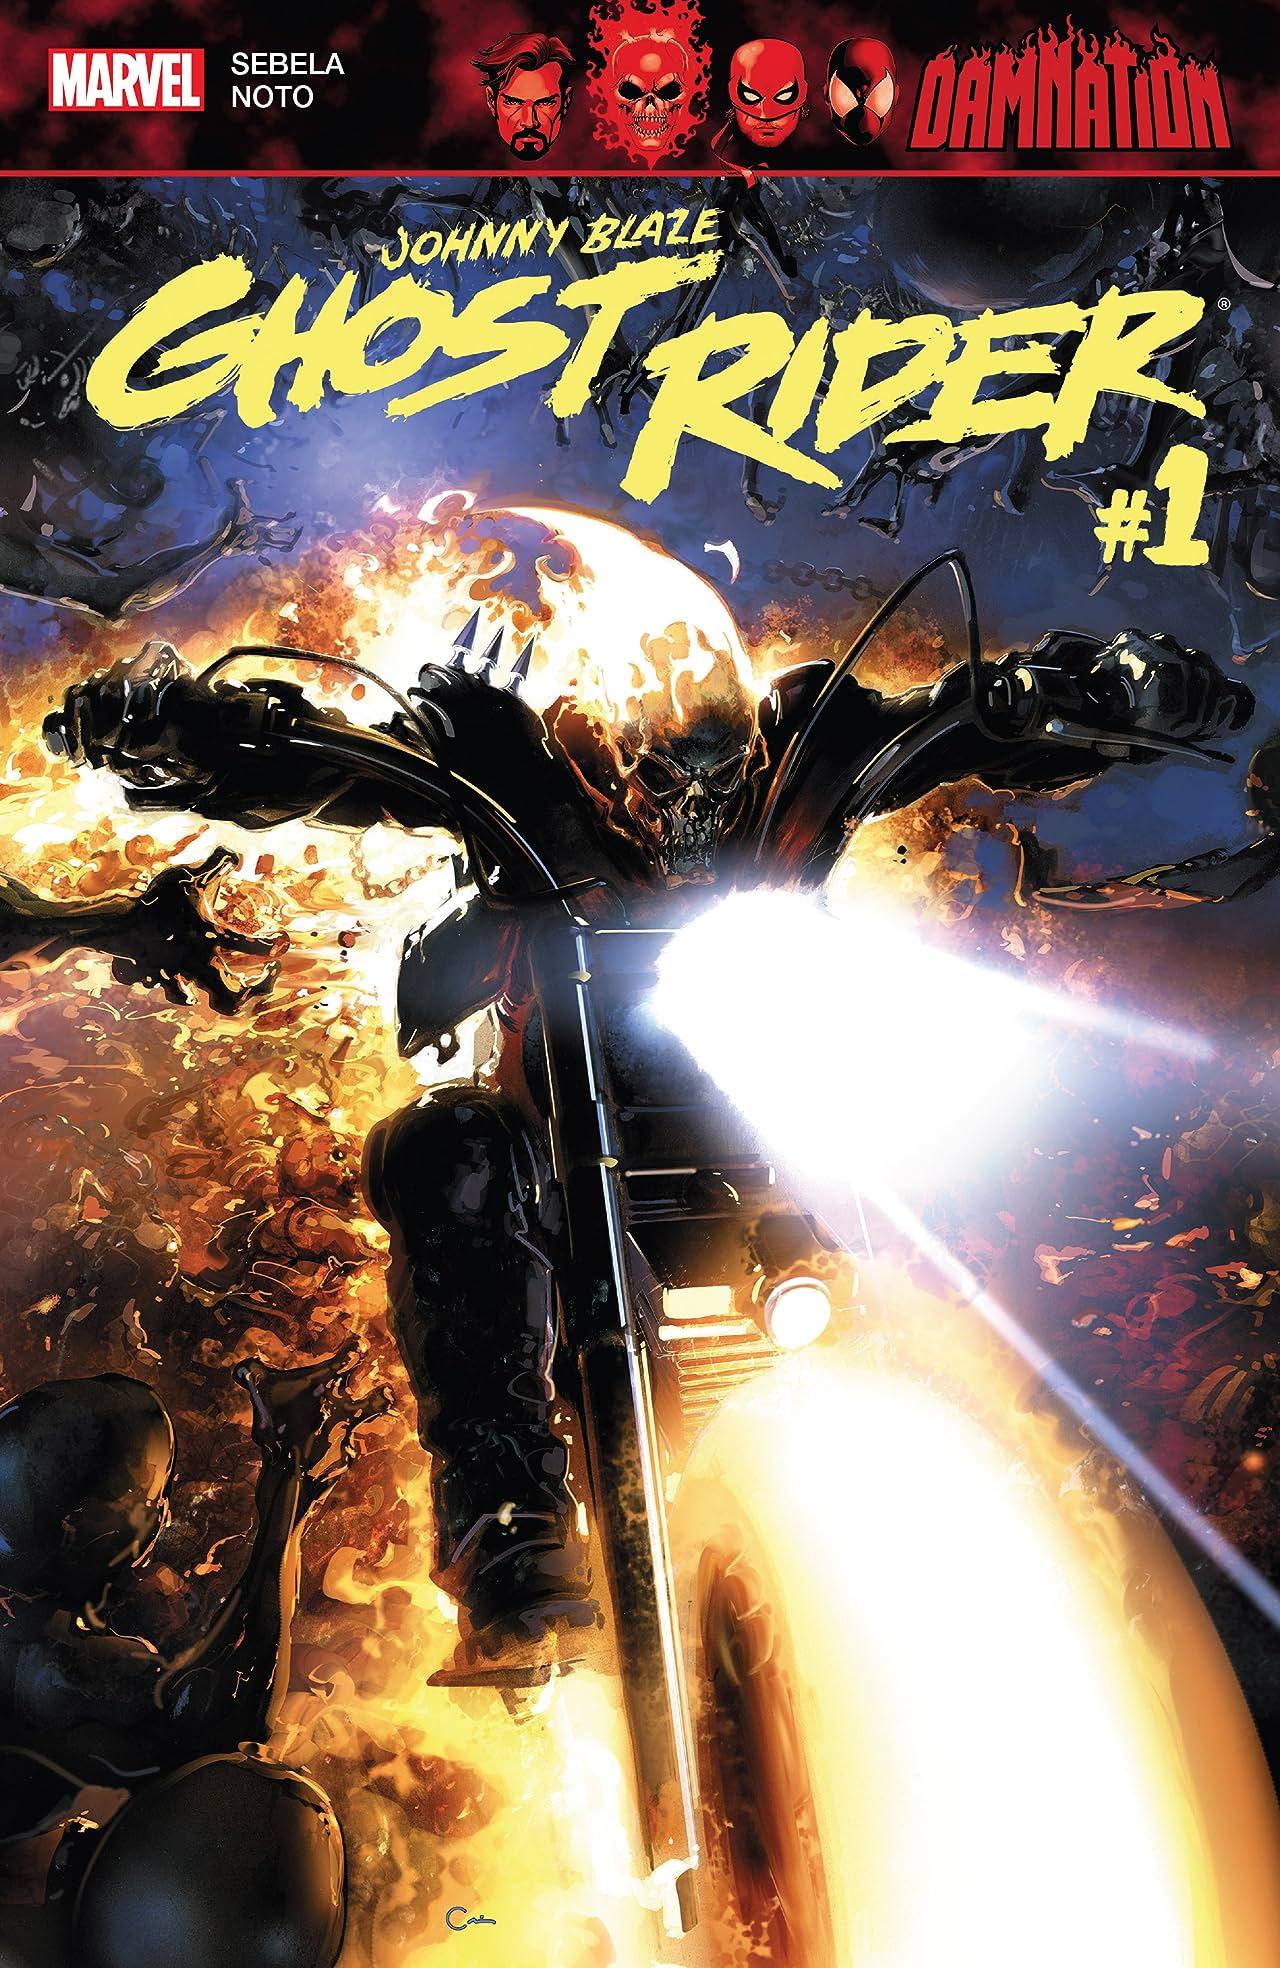 Damnation: Johnny Blaze - Ghost Rider (2018) #1